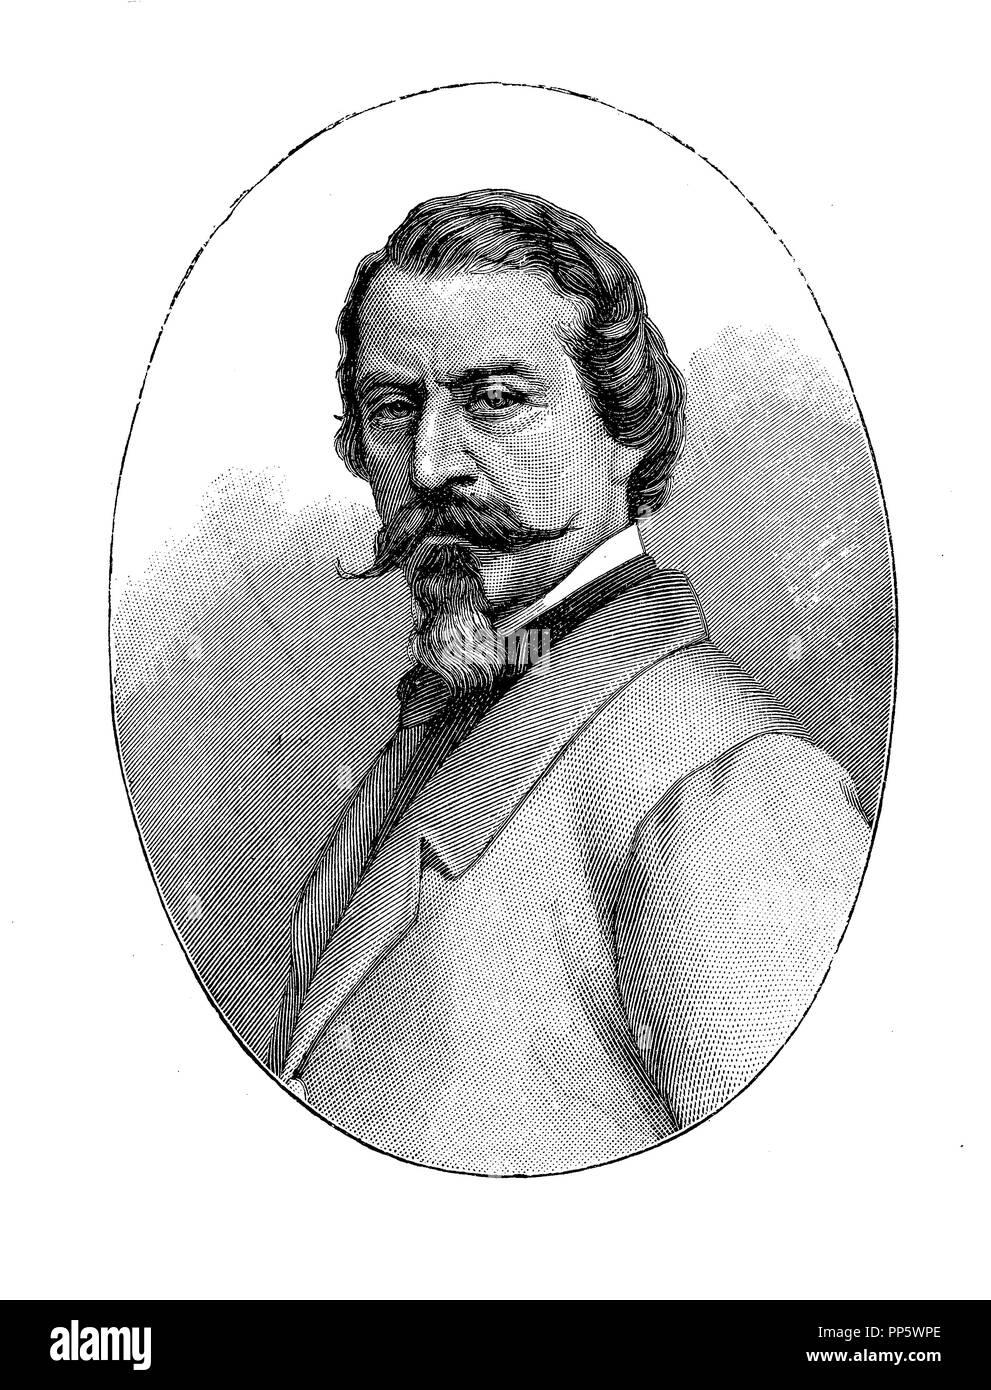 Engraving portrait of Aleardo Aleardi (1812-1878), Italian neo-romantic poet, member of Italian parliament and professor of aesthetics in Florence - Stock Image